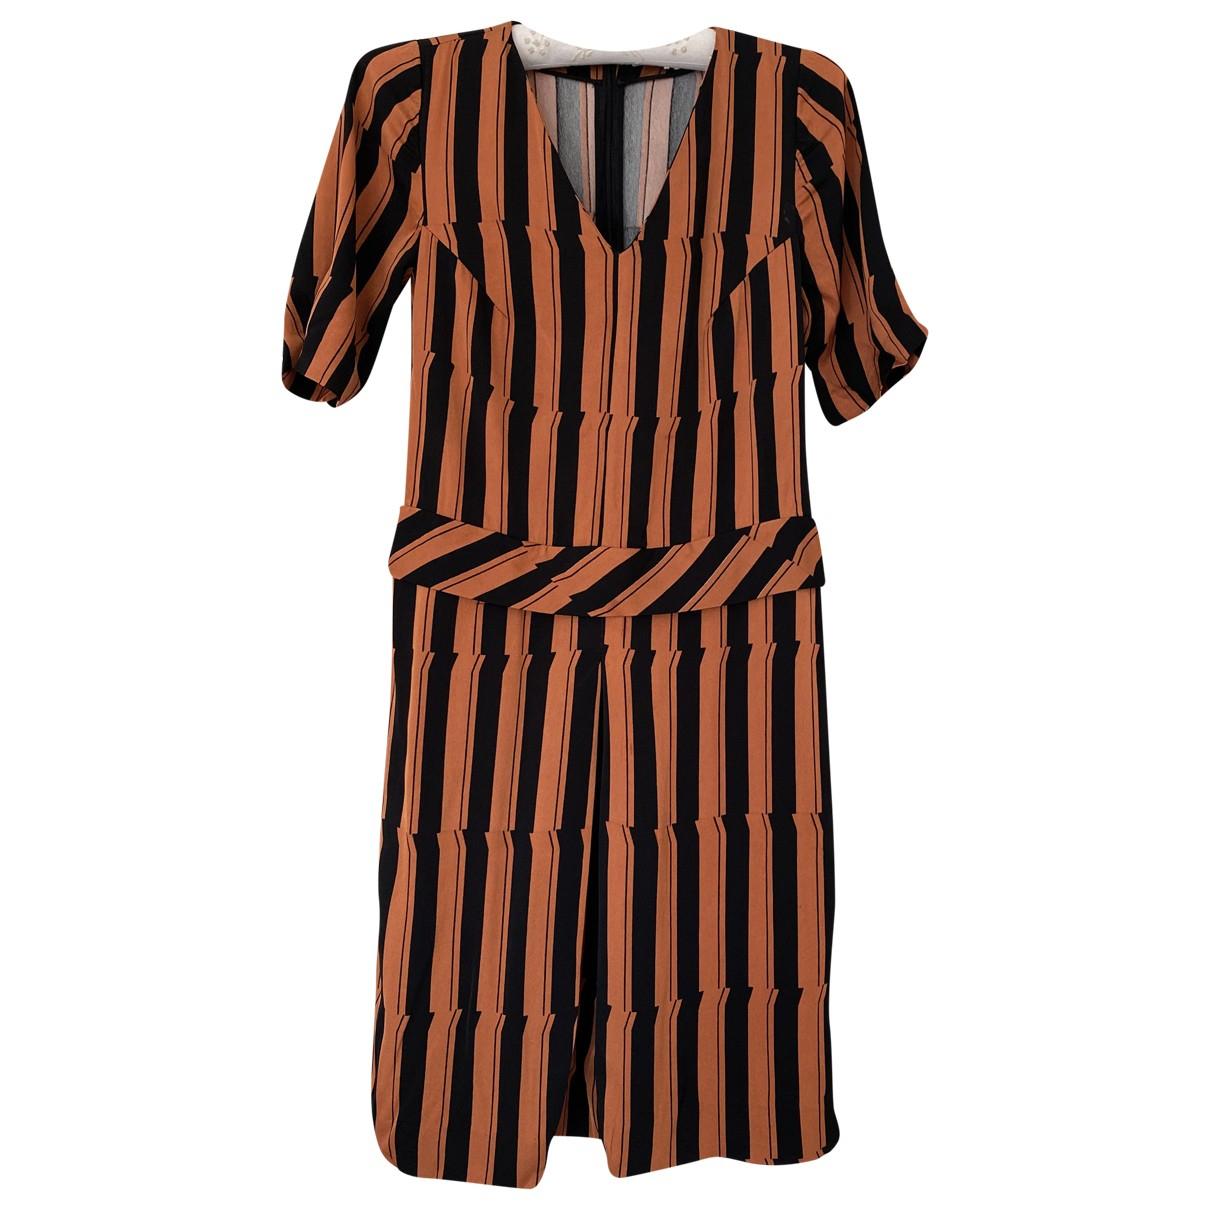 Bimba Y Lola \N Orange dress for Women XS International